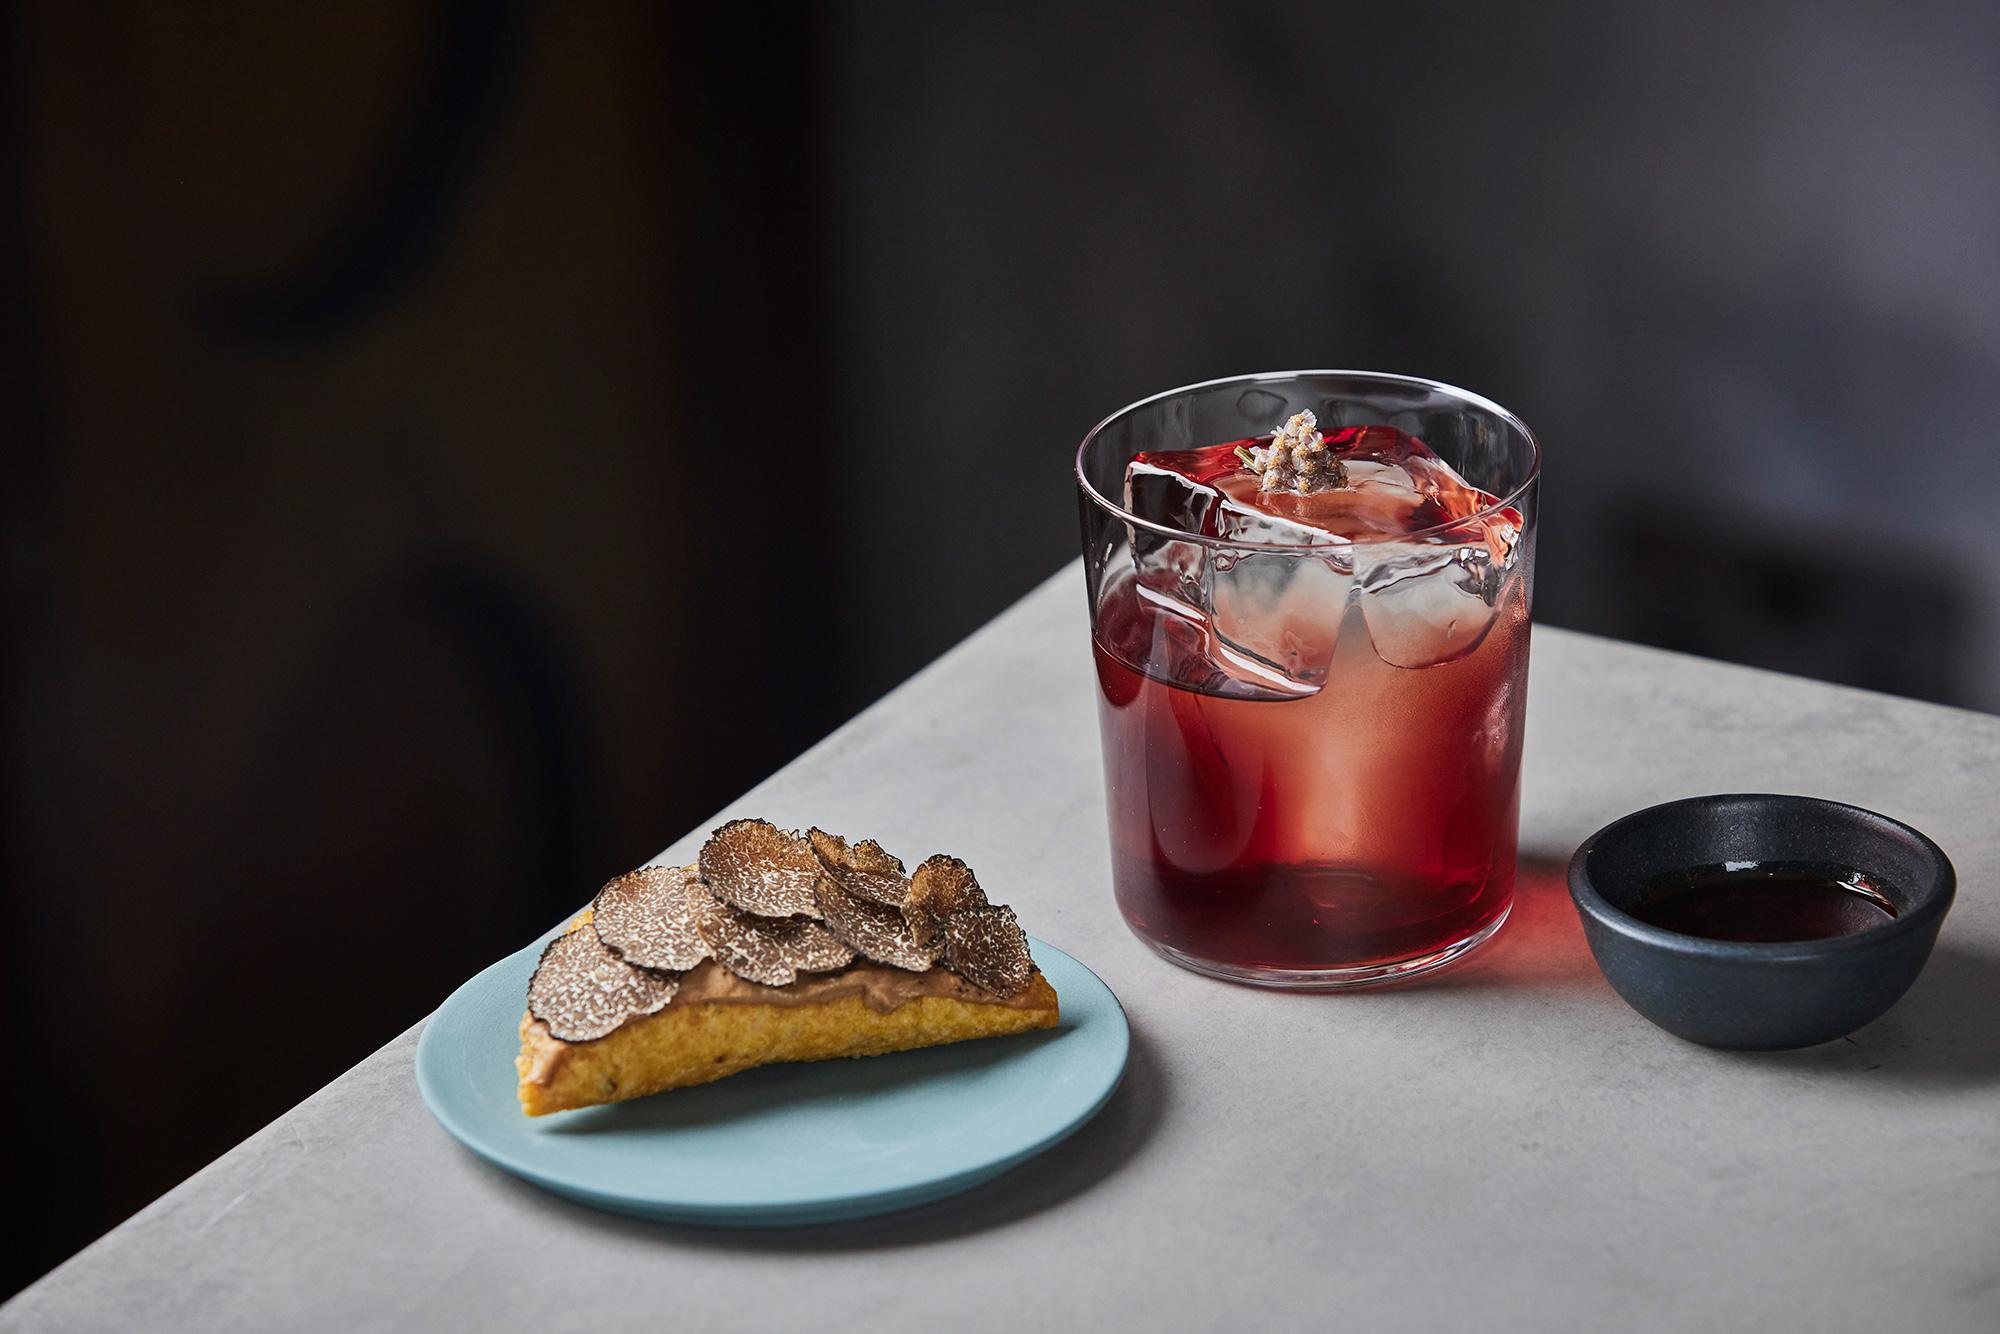 Sloe Grape Mezcal Negroni made with homemade sloe mezcal, Campari, Cocchi Torino sweet vermouth, Bava Uvantica Malvasia, with a pickled yarrow flower garnish. Photograph: Charlie McKay